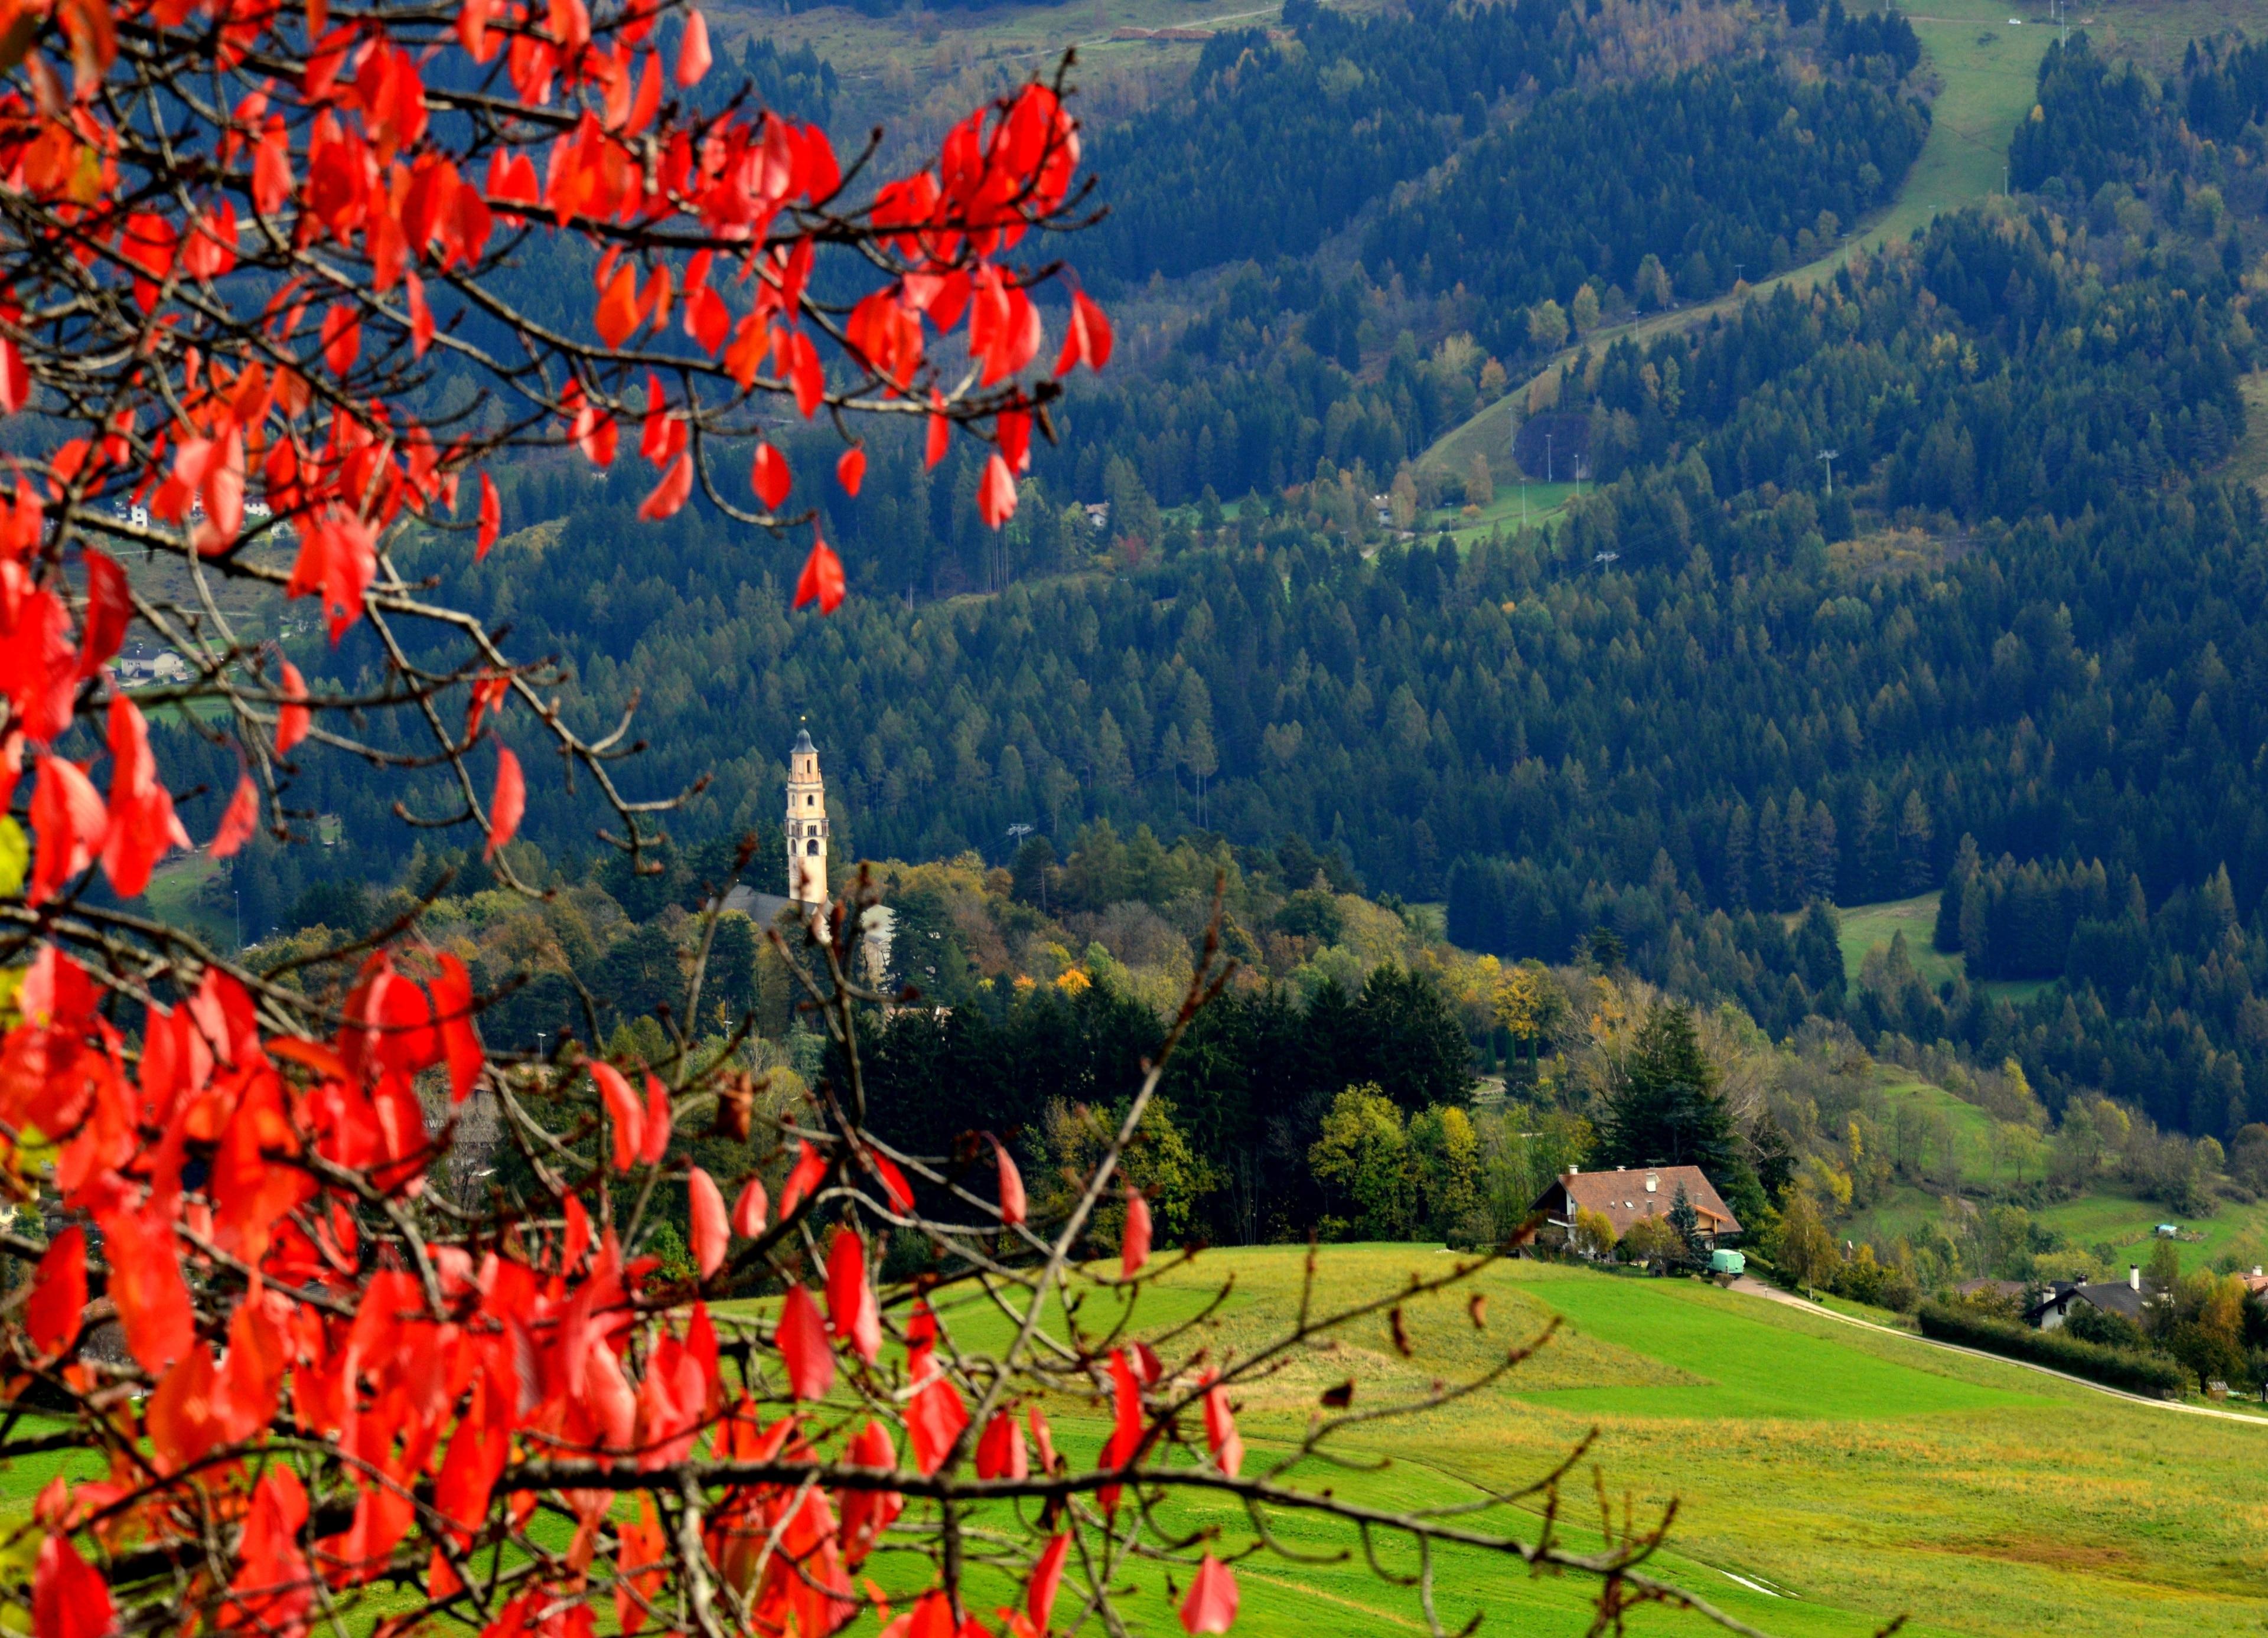 Daiano, Ville di Fiemme, Trentino-Zuid-Tirol, Italië